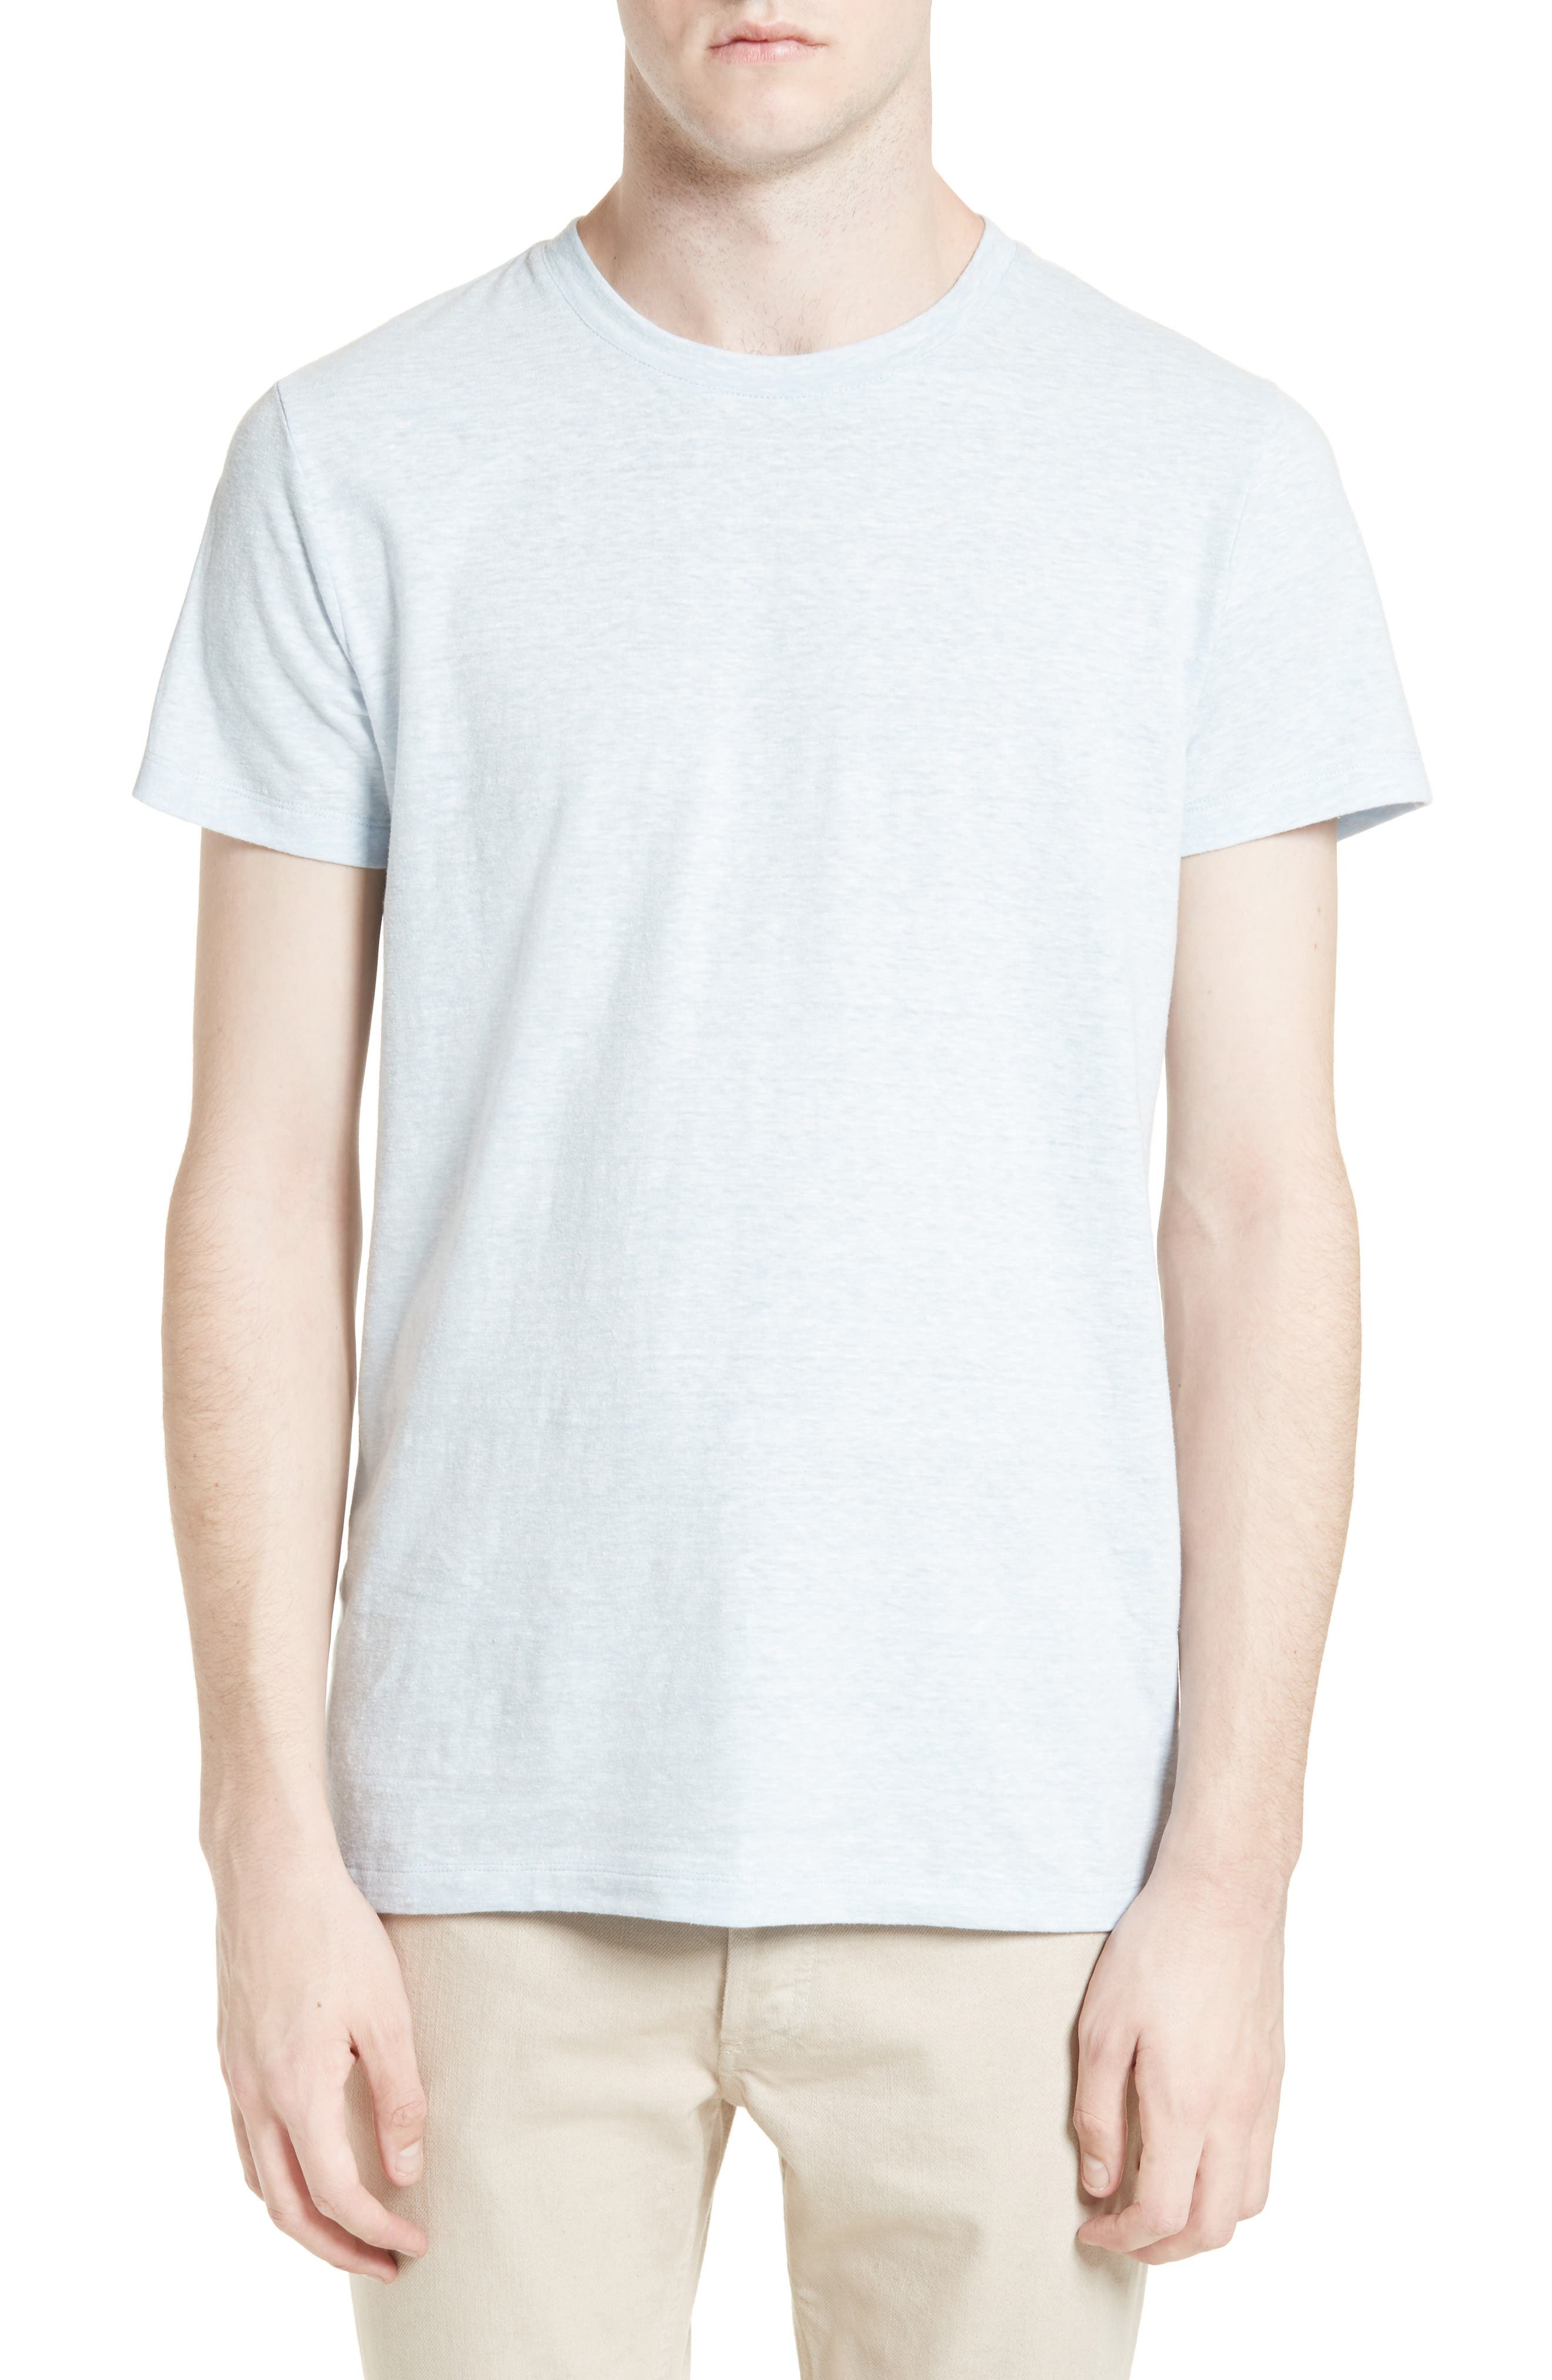 Jimmy T-Shirt,                         Main,                         color, 400